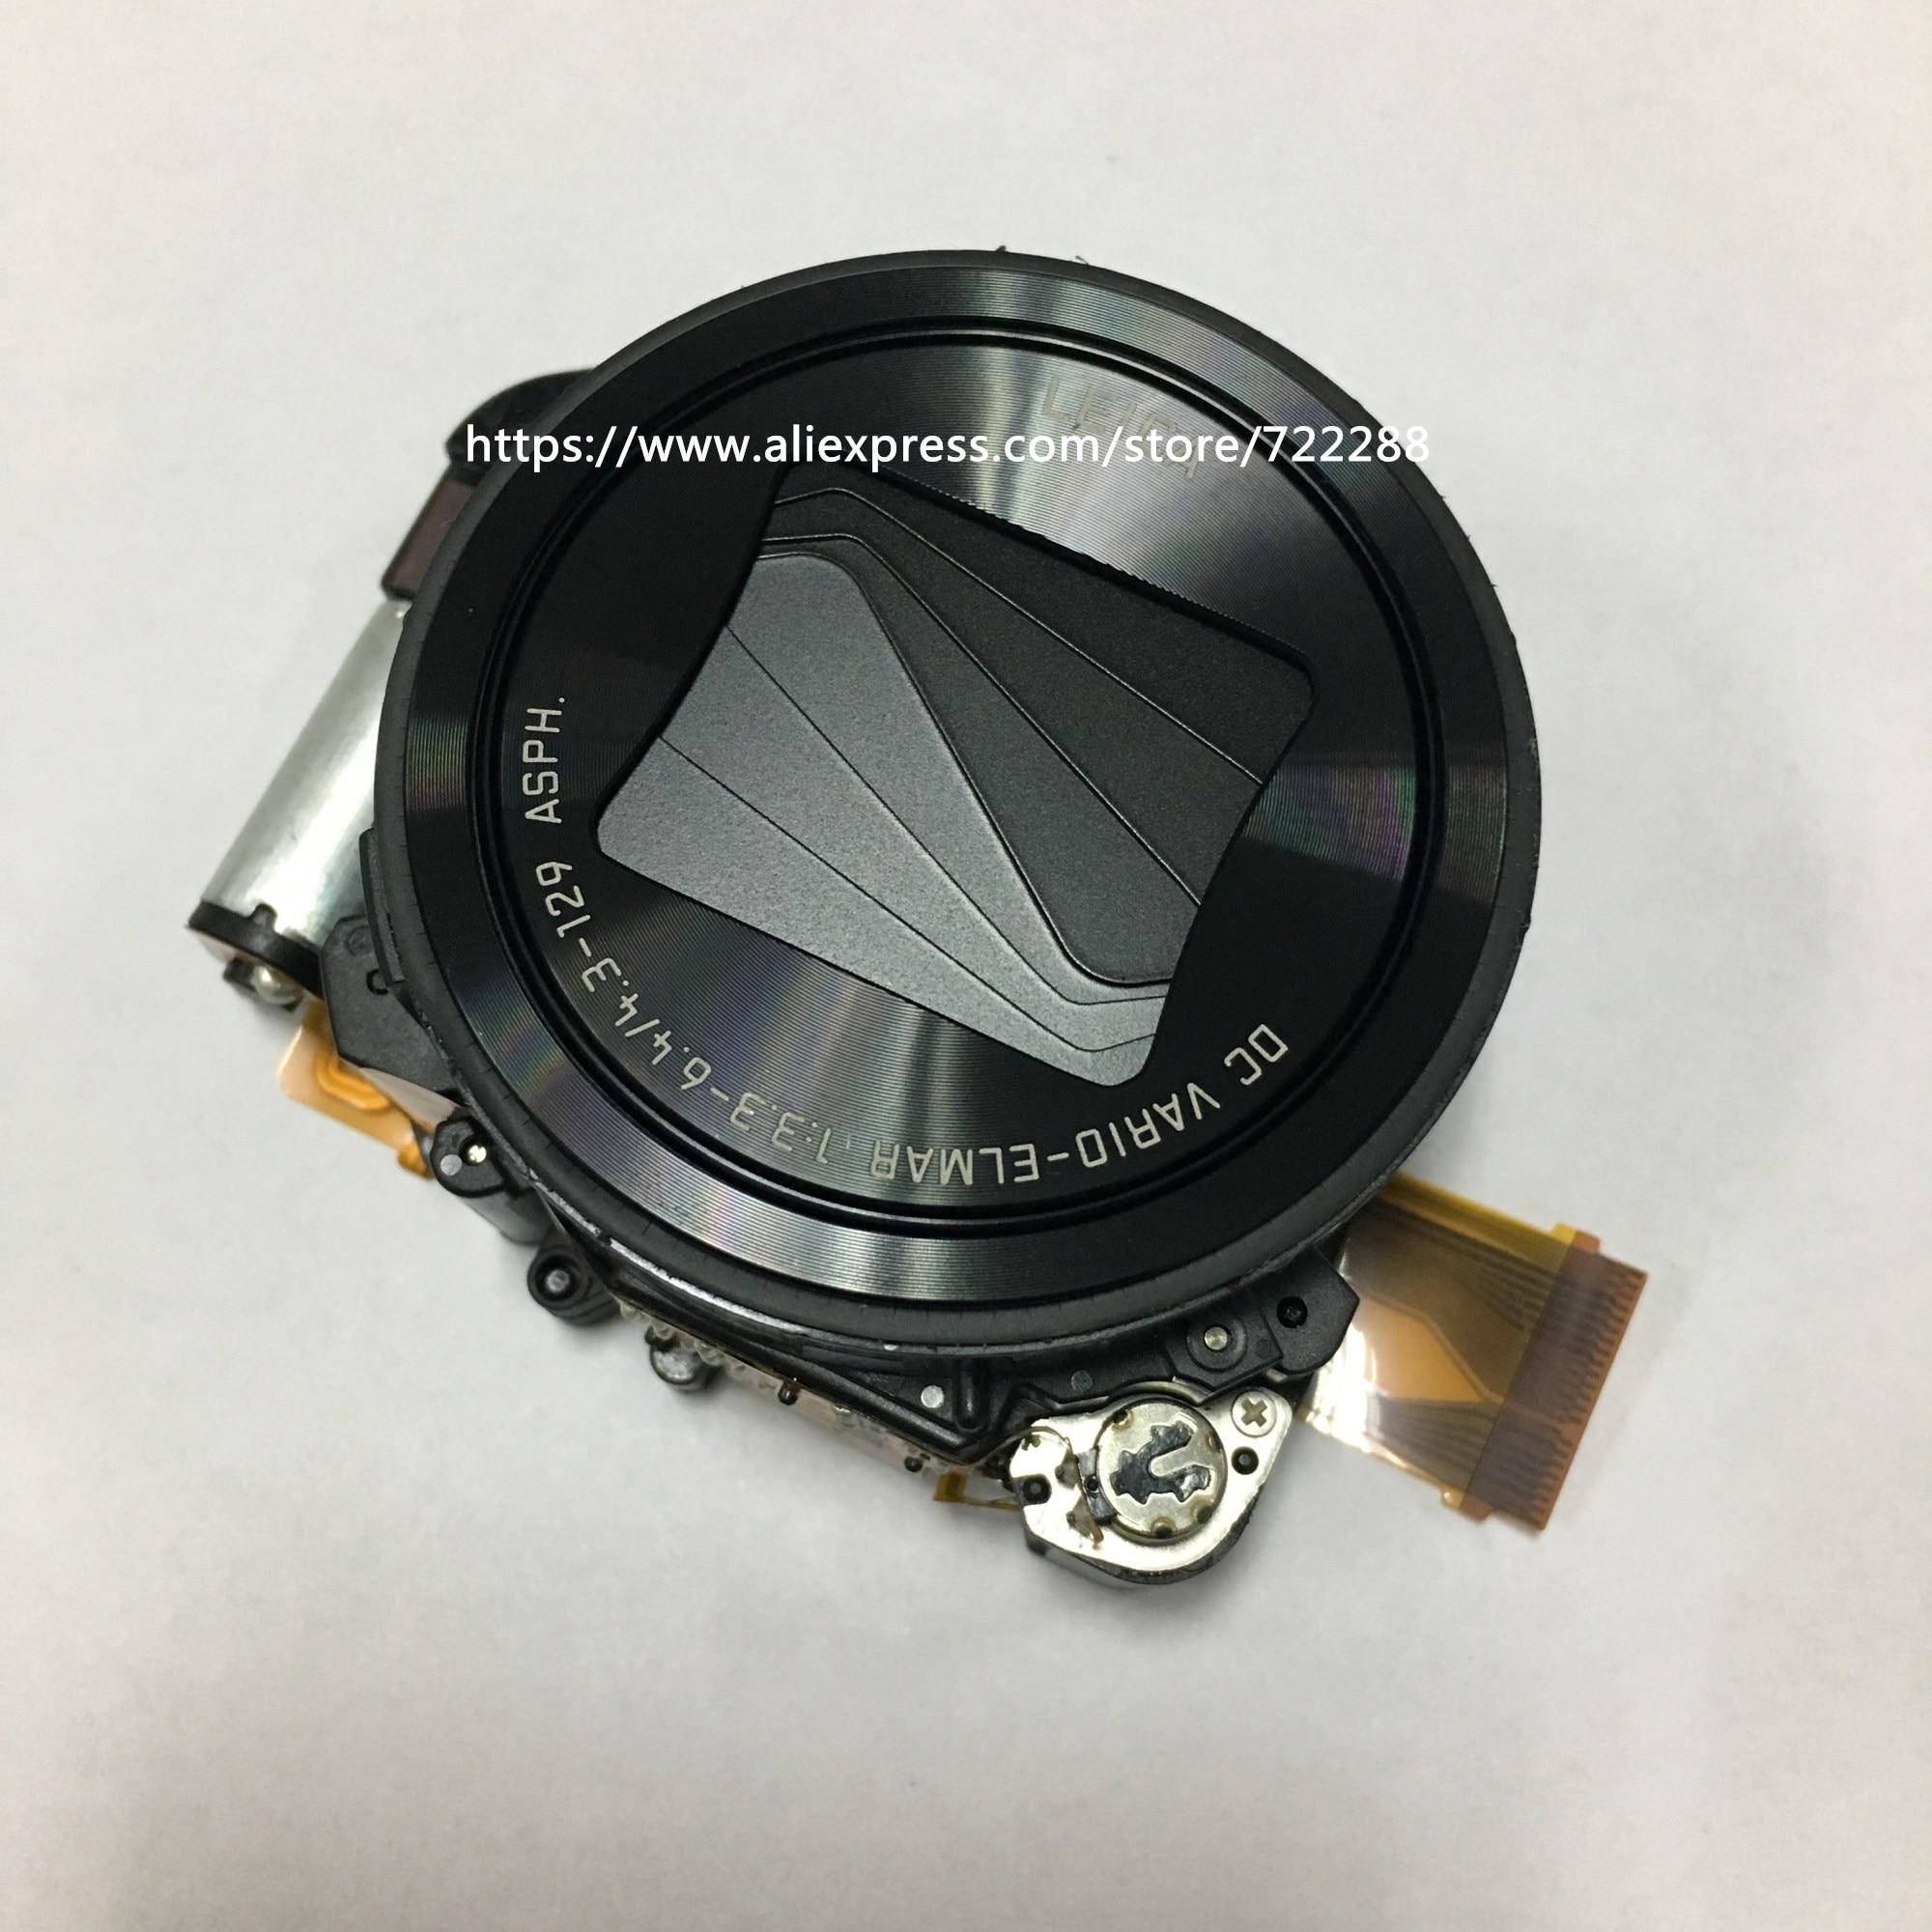 Repair Parts For Panasonic Lumix DMC TZ80 DMC TZ81 DC TZ90 DC TZ91 DMC ZS60 DC